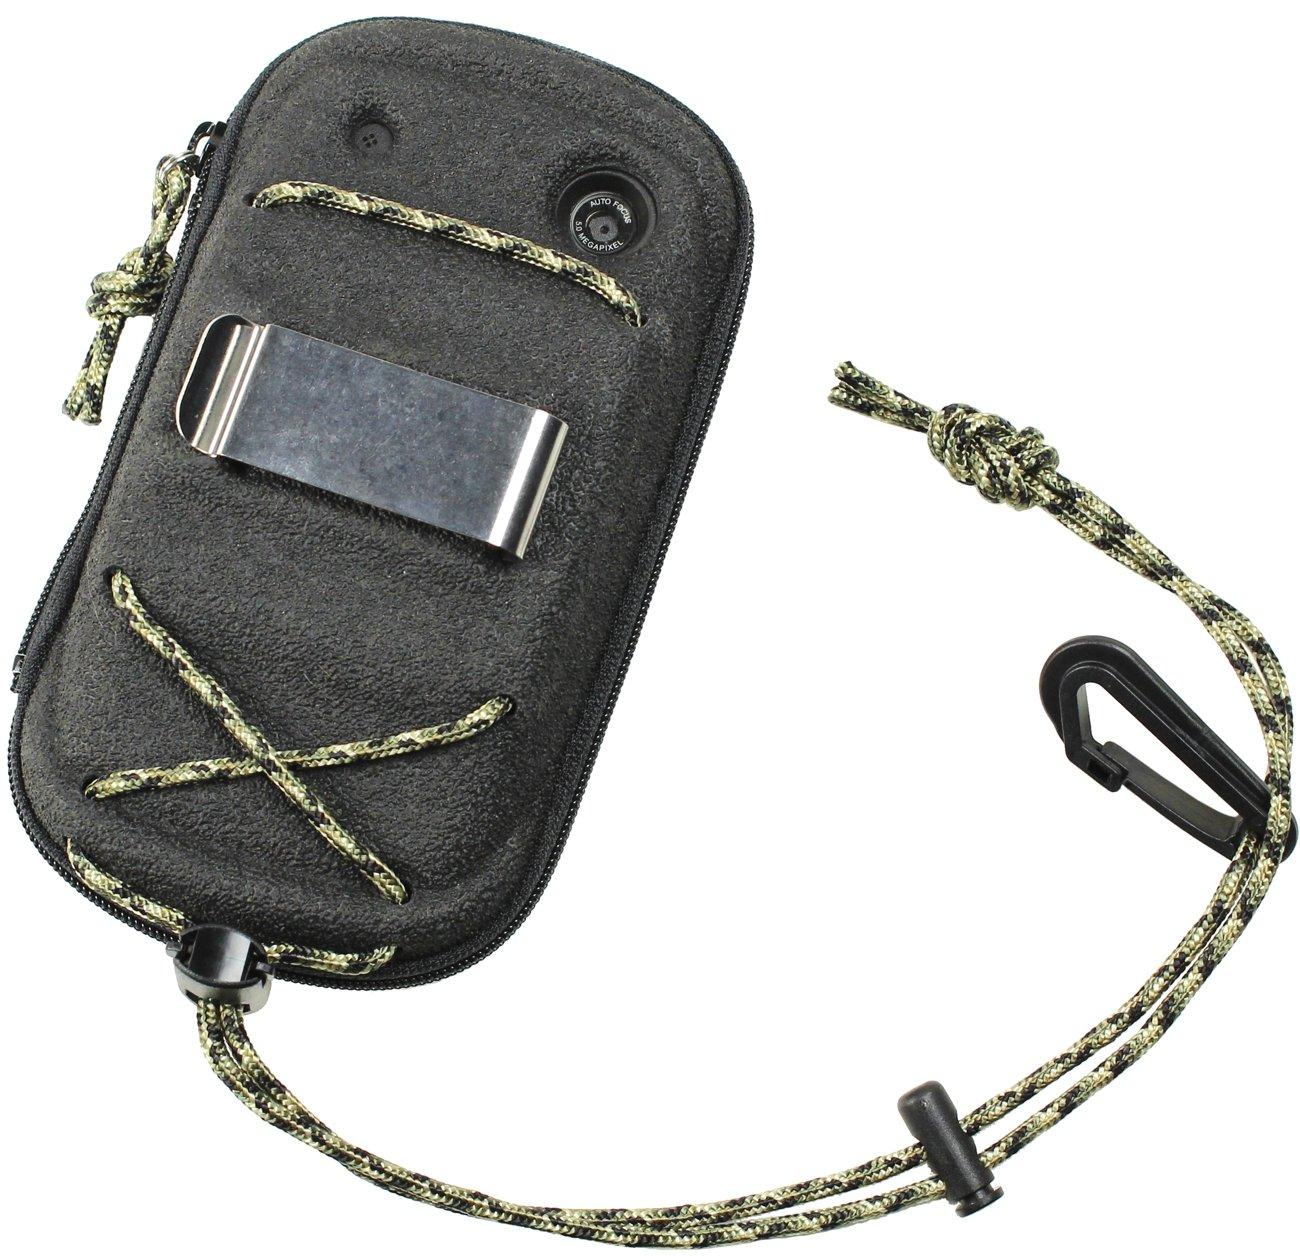 Garmin Montana 650t 650 600 Montana Case Heavy-Duty in Black with ...